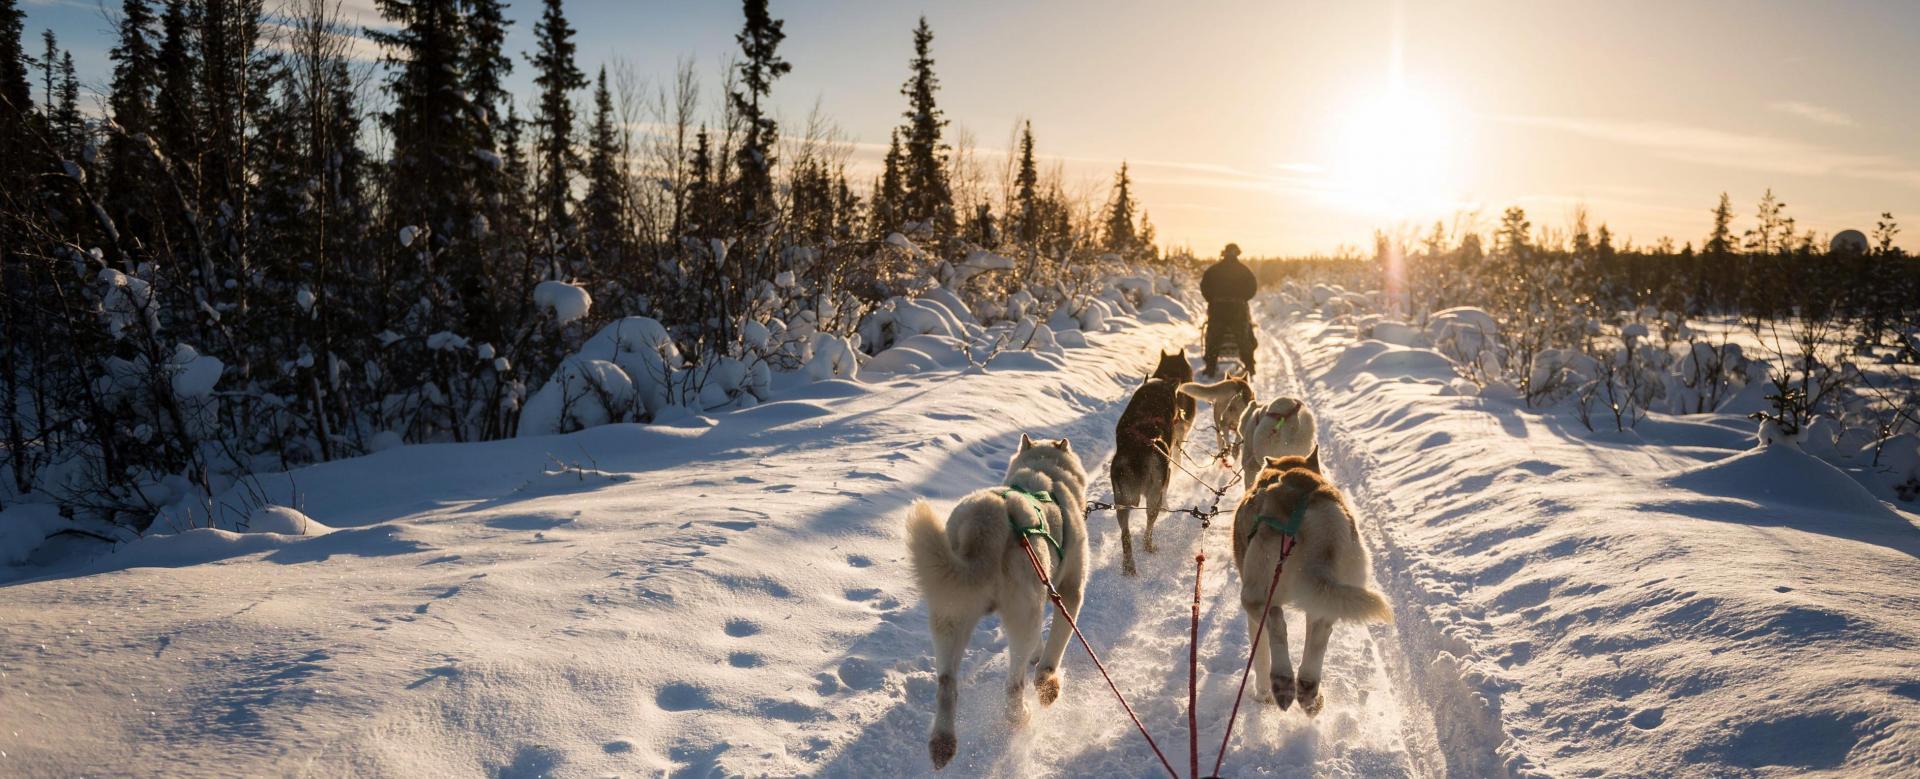 Voyage à la neige Finlande : L'attelage du grand nord